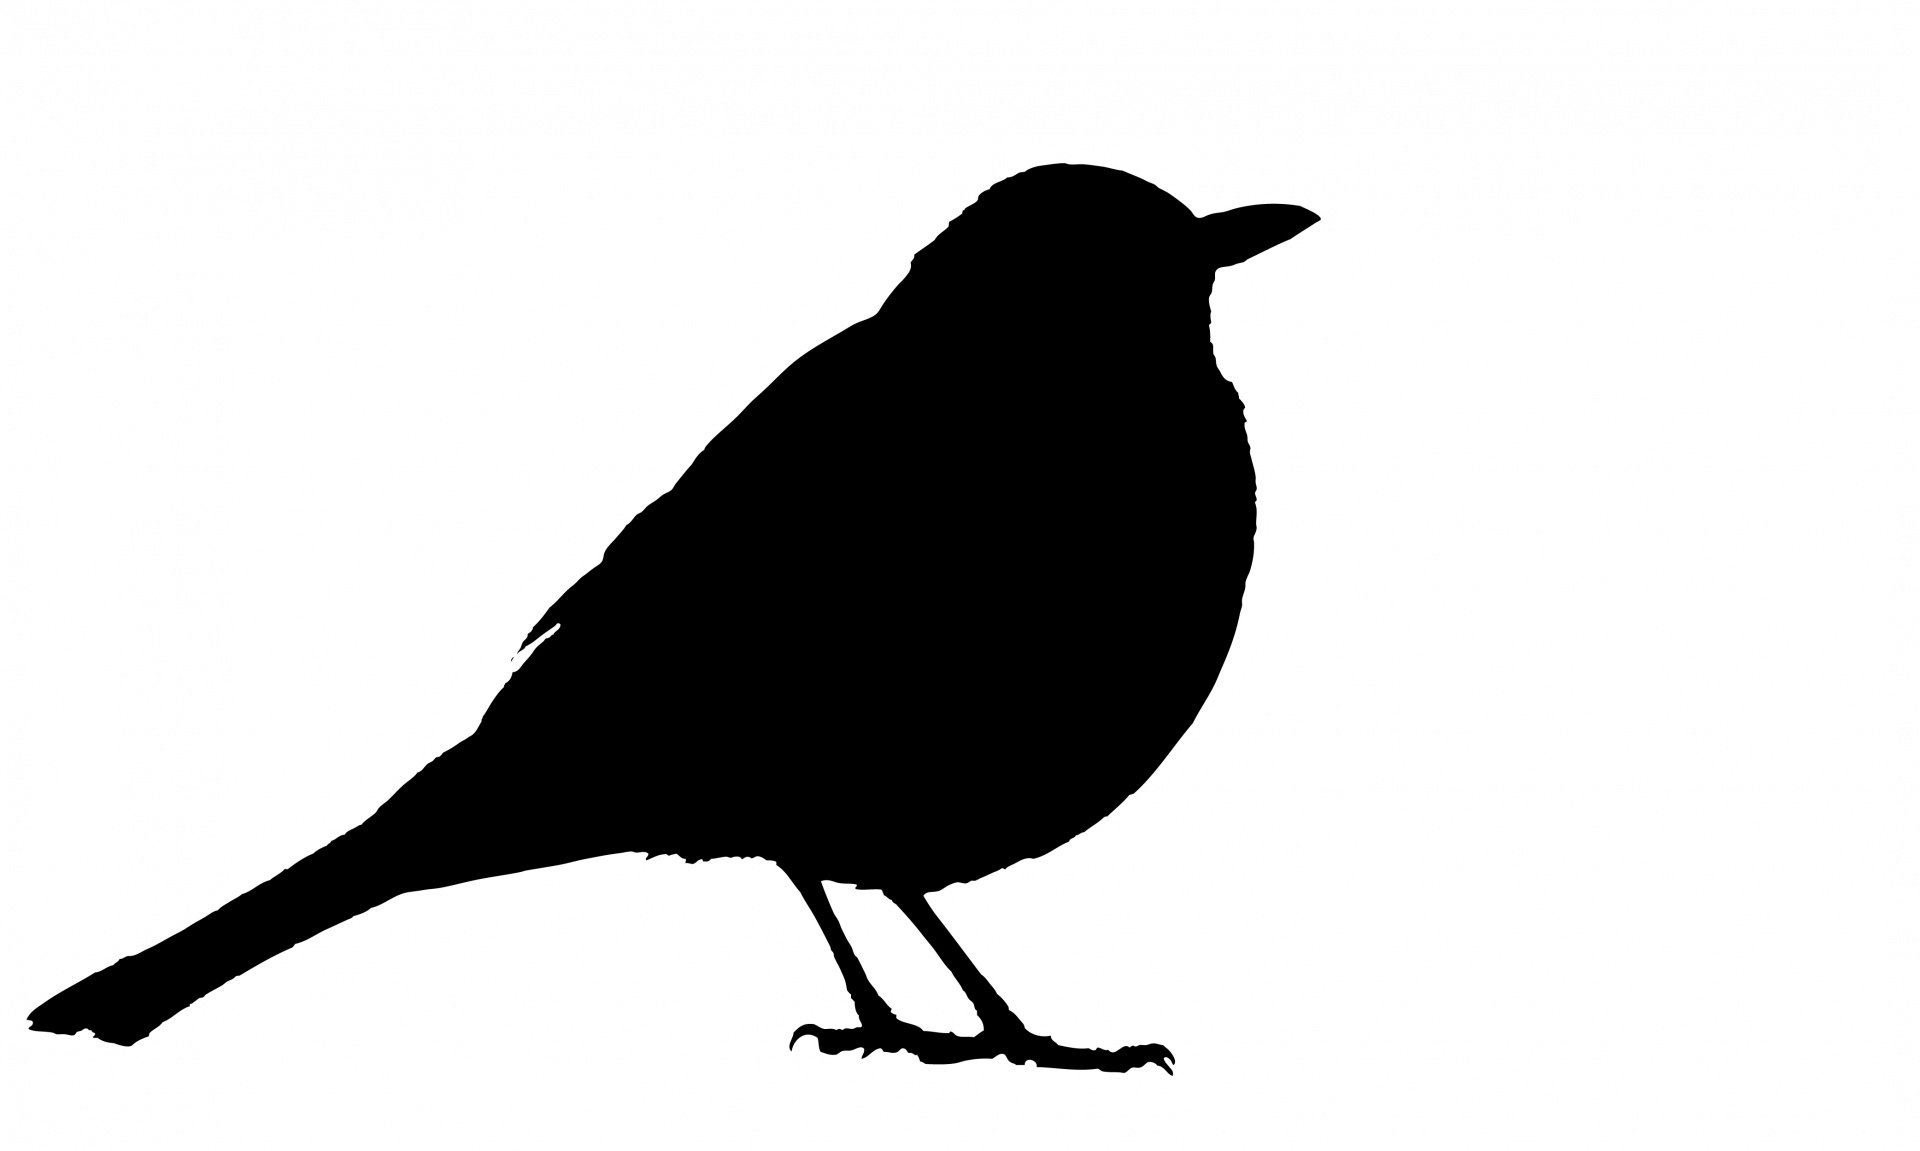 blackbird-silhouette-1496655320N1W-1